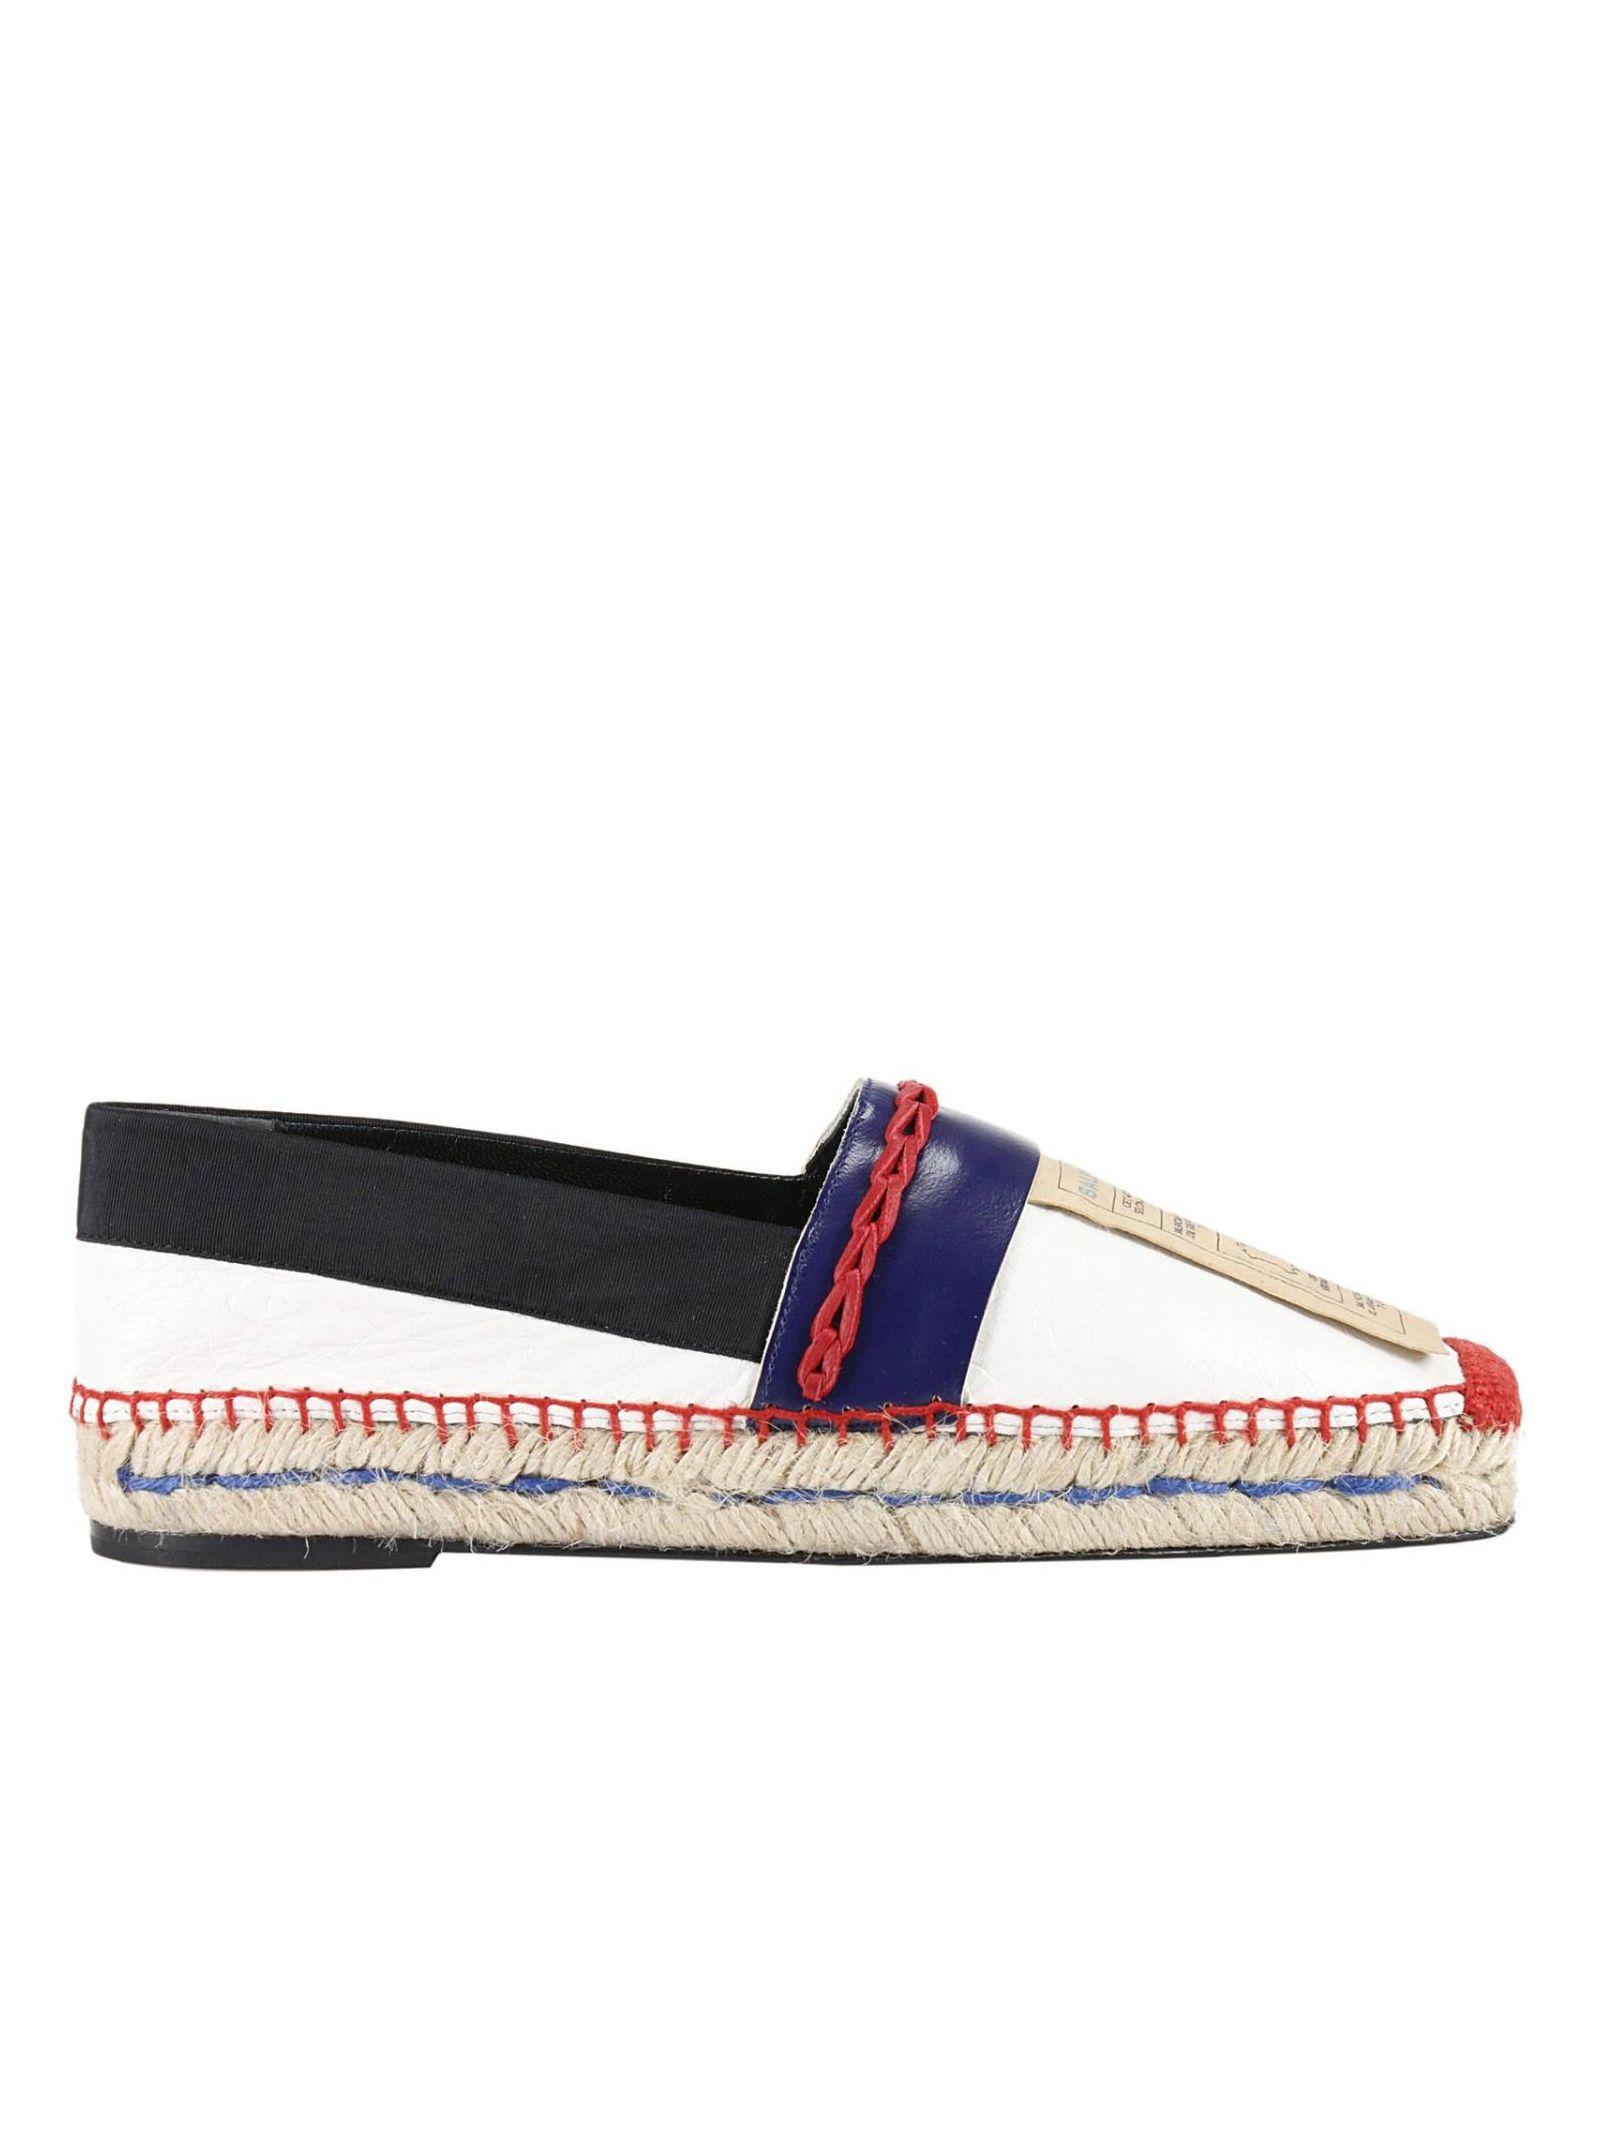 balenciaga female flat shoes shoes women balenciaga